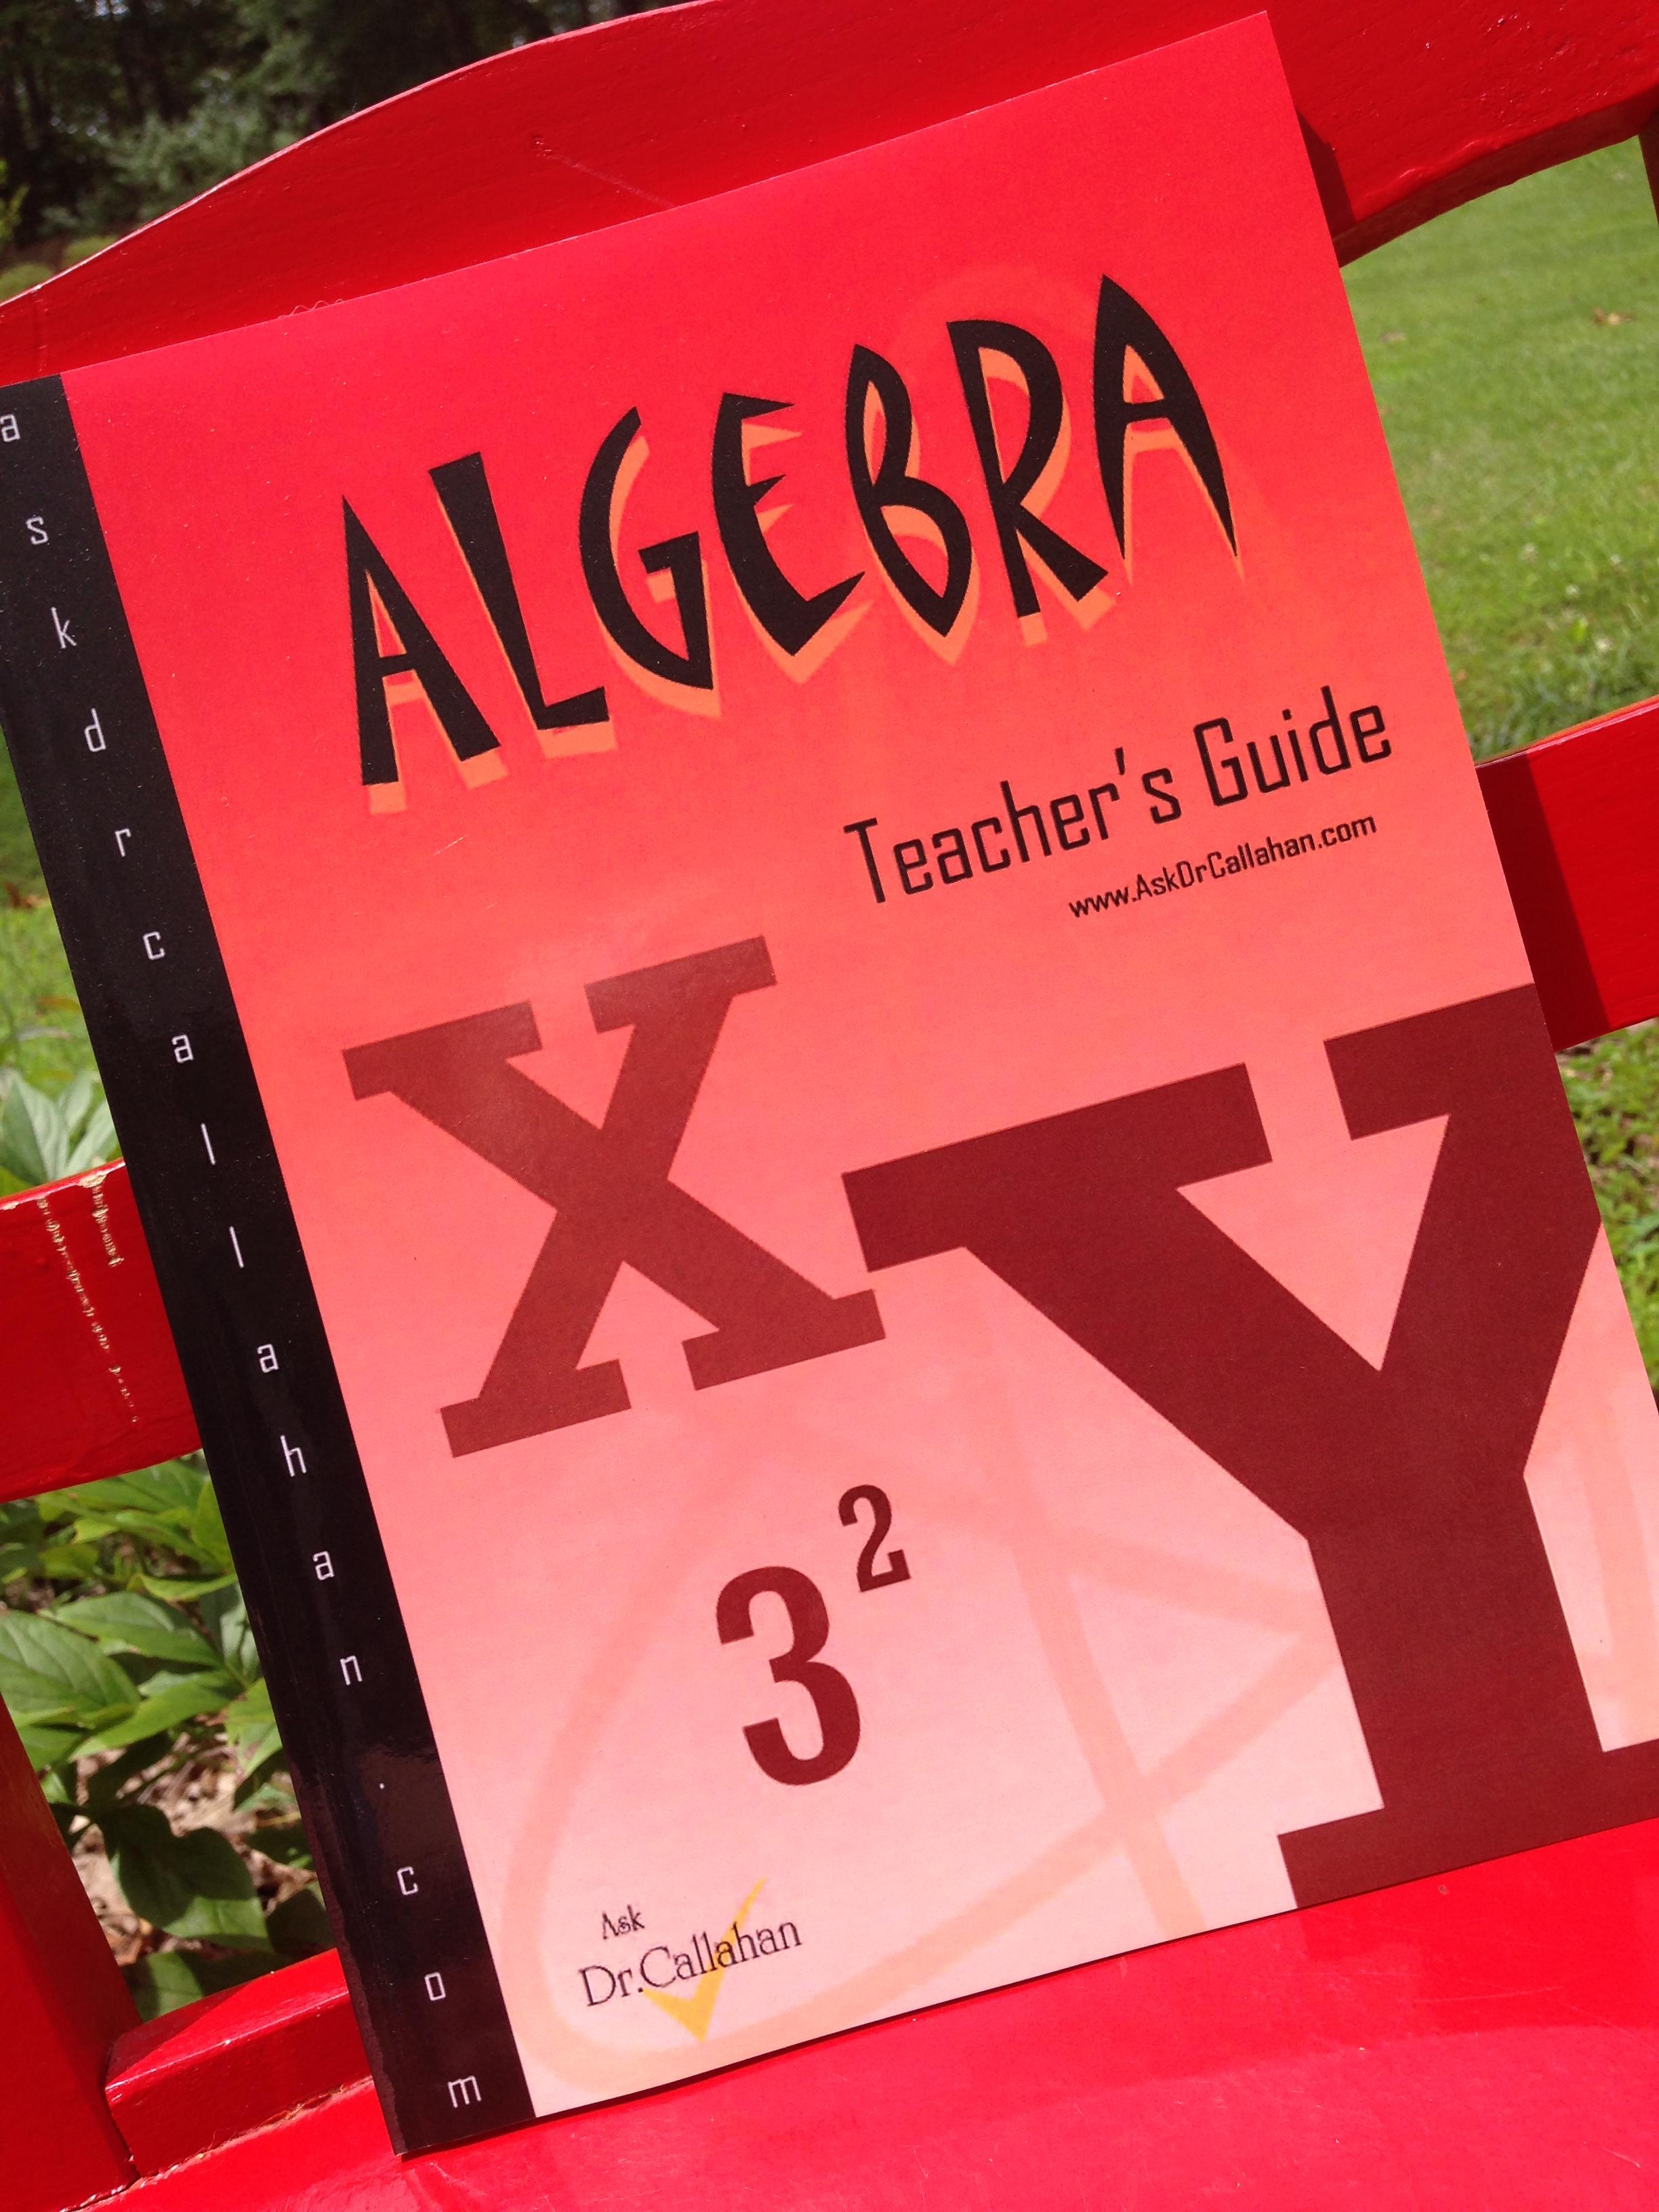 Algebra Teacher's Guide for AskDrCallahan